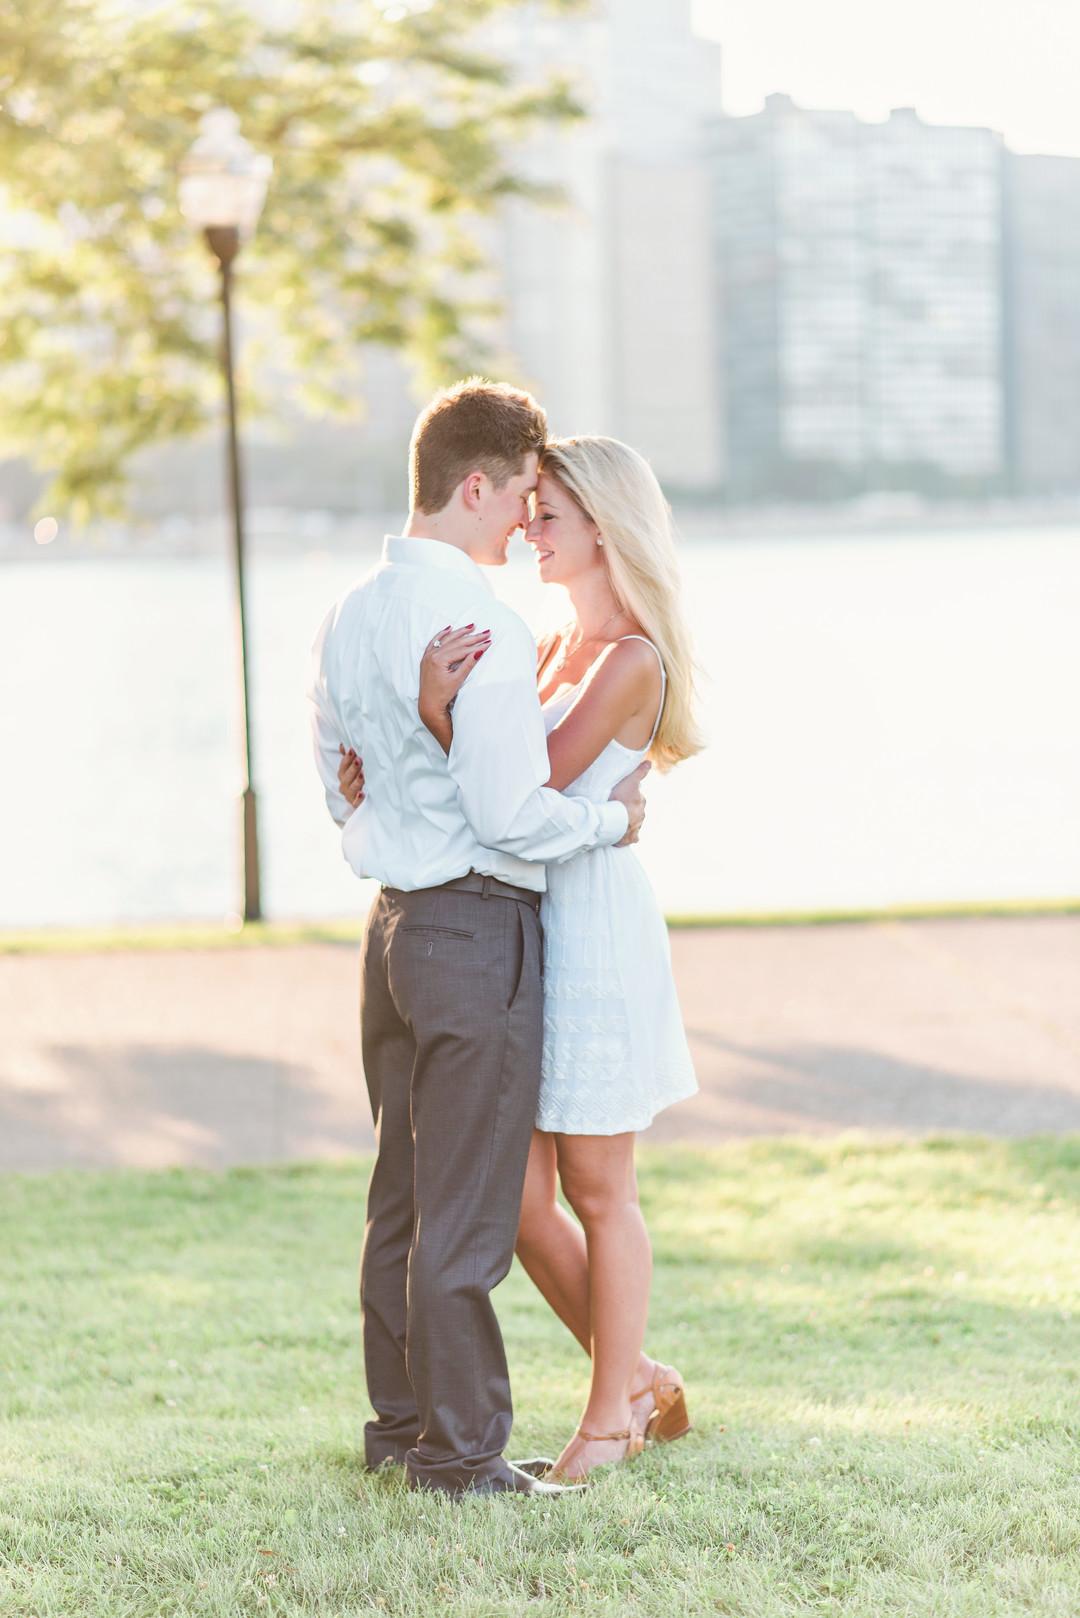 Chicago Engagement Photoshoot Cody Krogman Photography